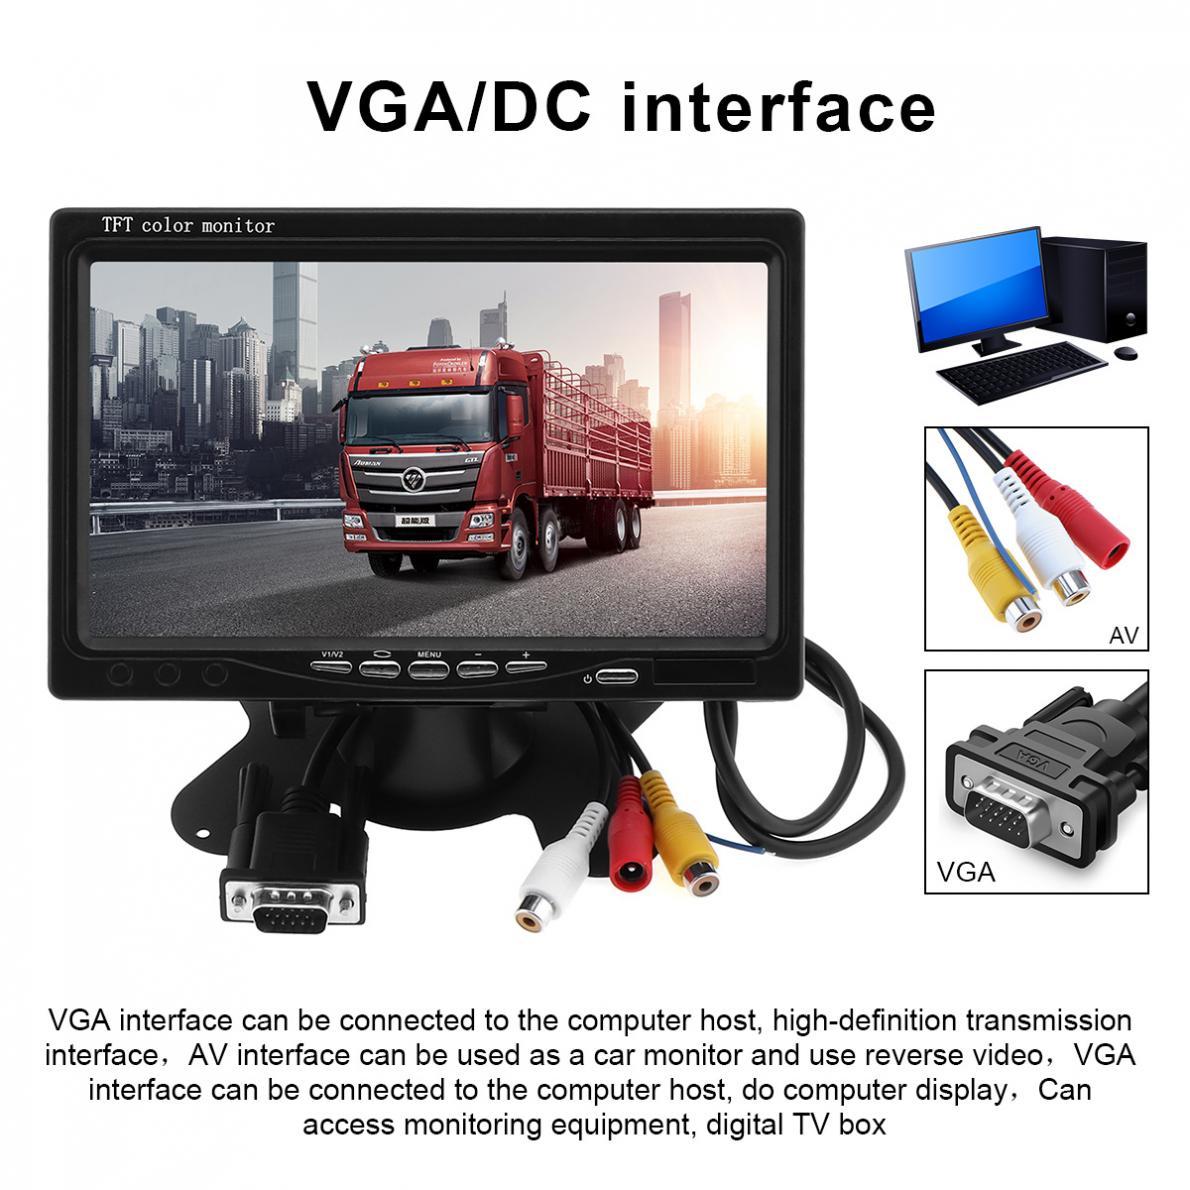 7 Inch 1024x600 12V HD TFT LCD Car VGA Home Monitor Bright Color VGA Interface AV Auto Video Player PAL / NTSC / SCAME